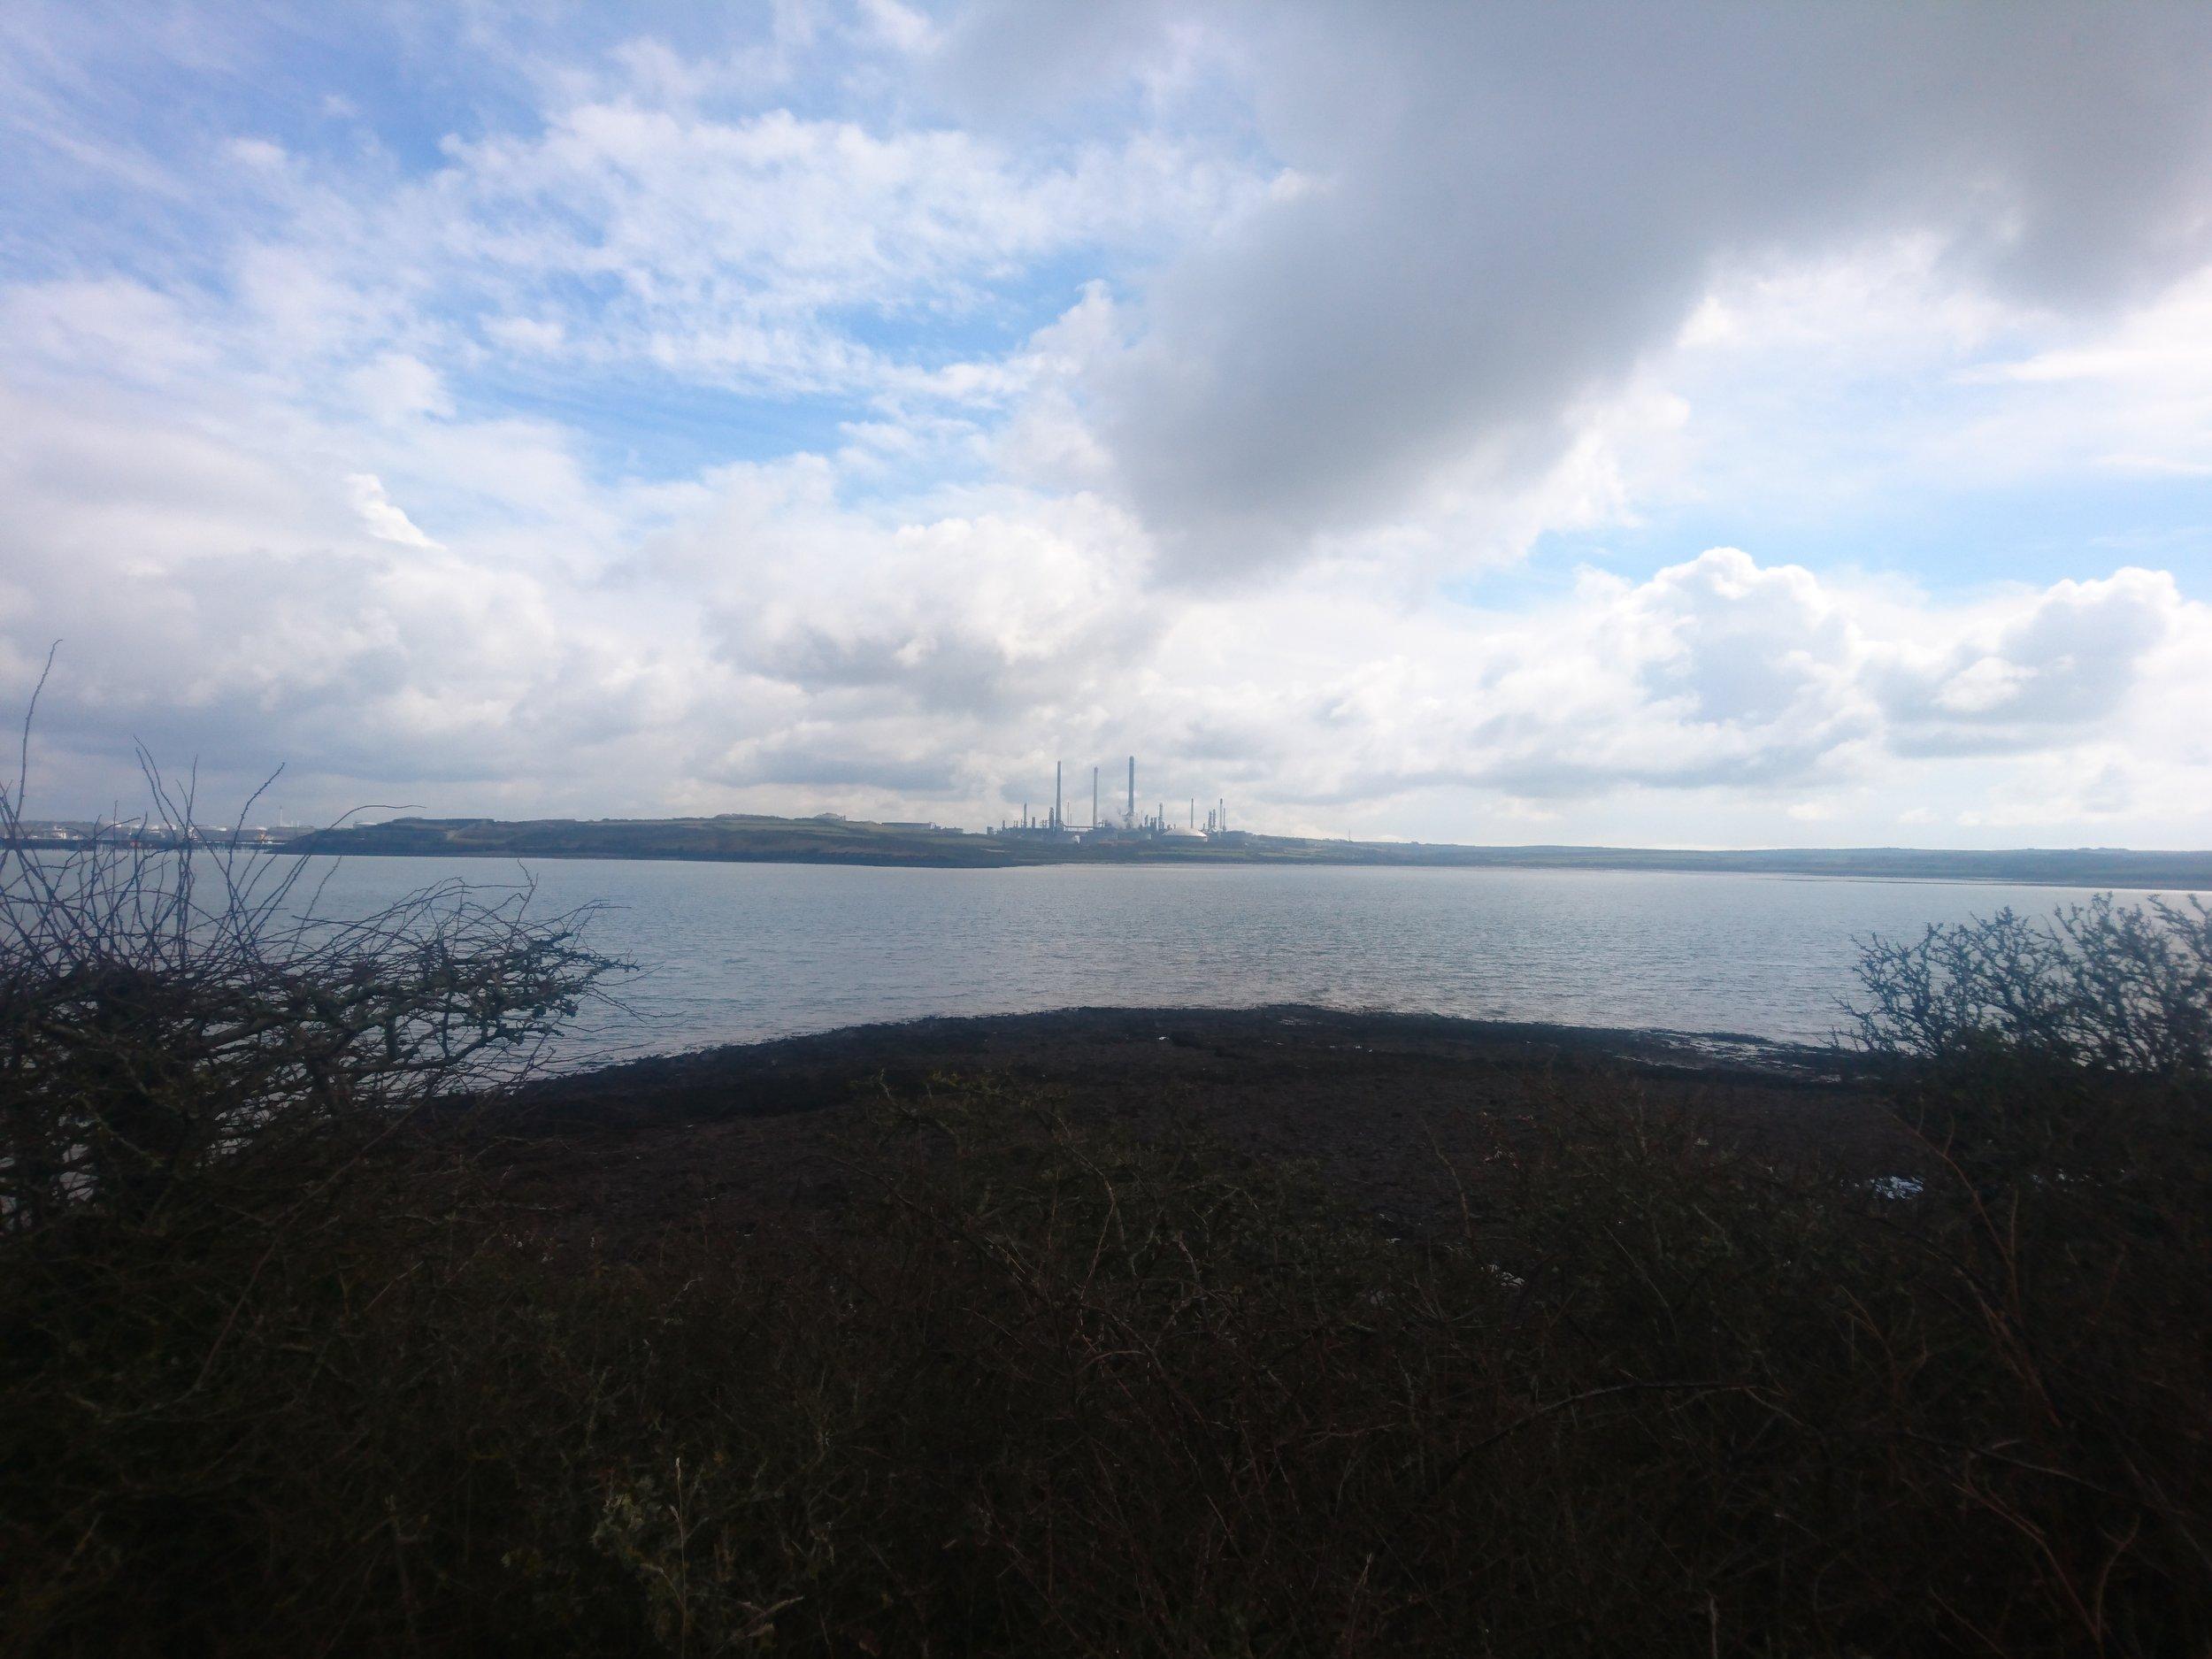 Pembroke Oil Refinery I